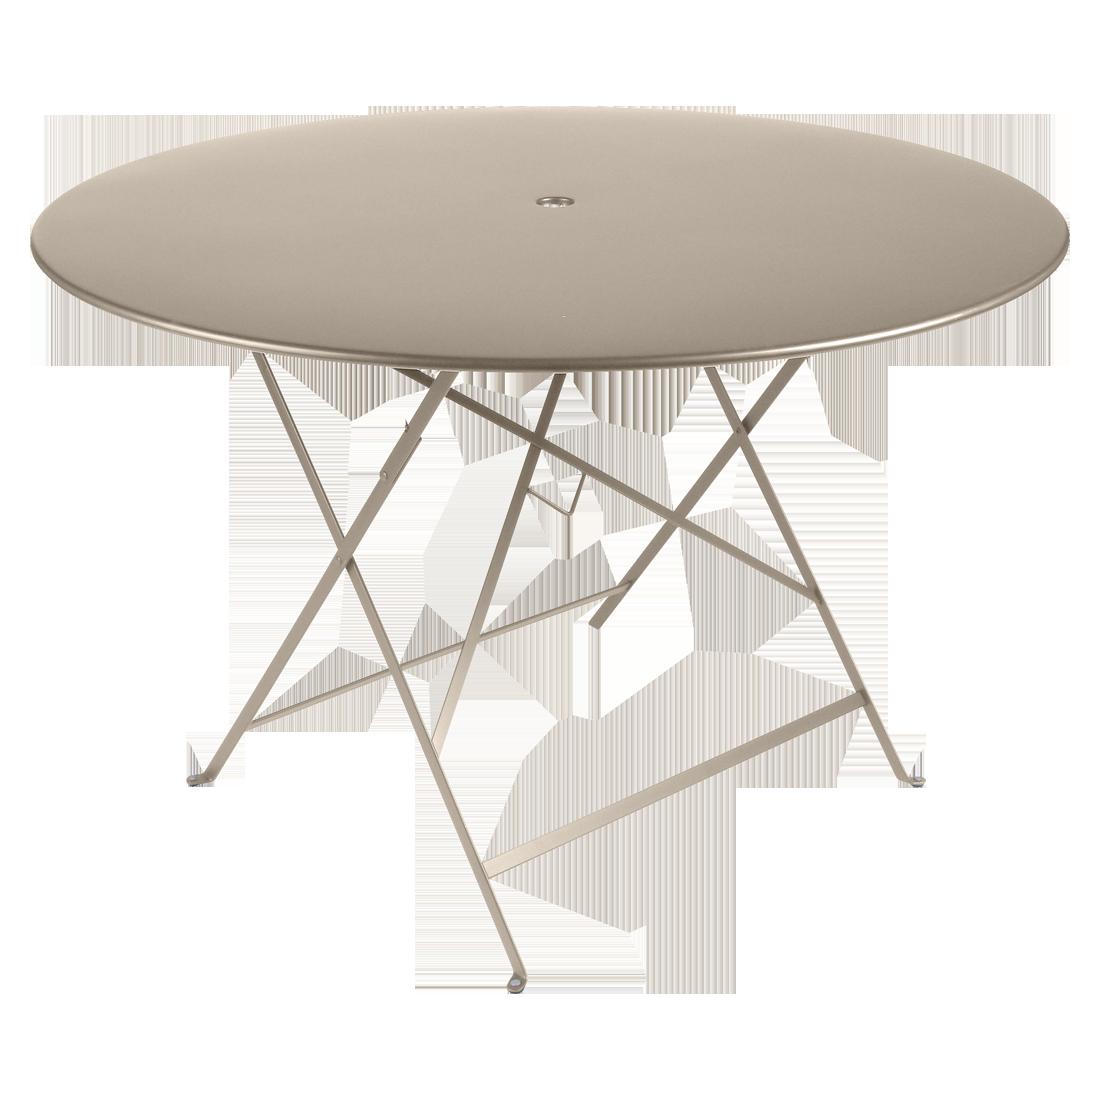 petite table metal, table de jardin fermob, table bistro, petite table pliante, table beige